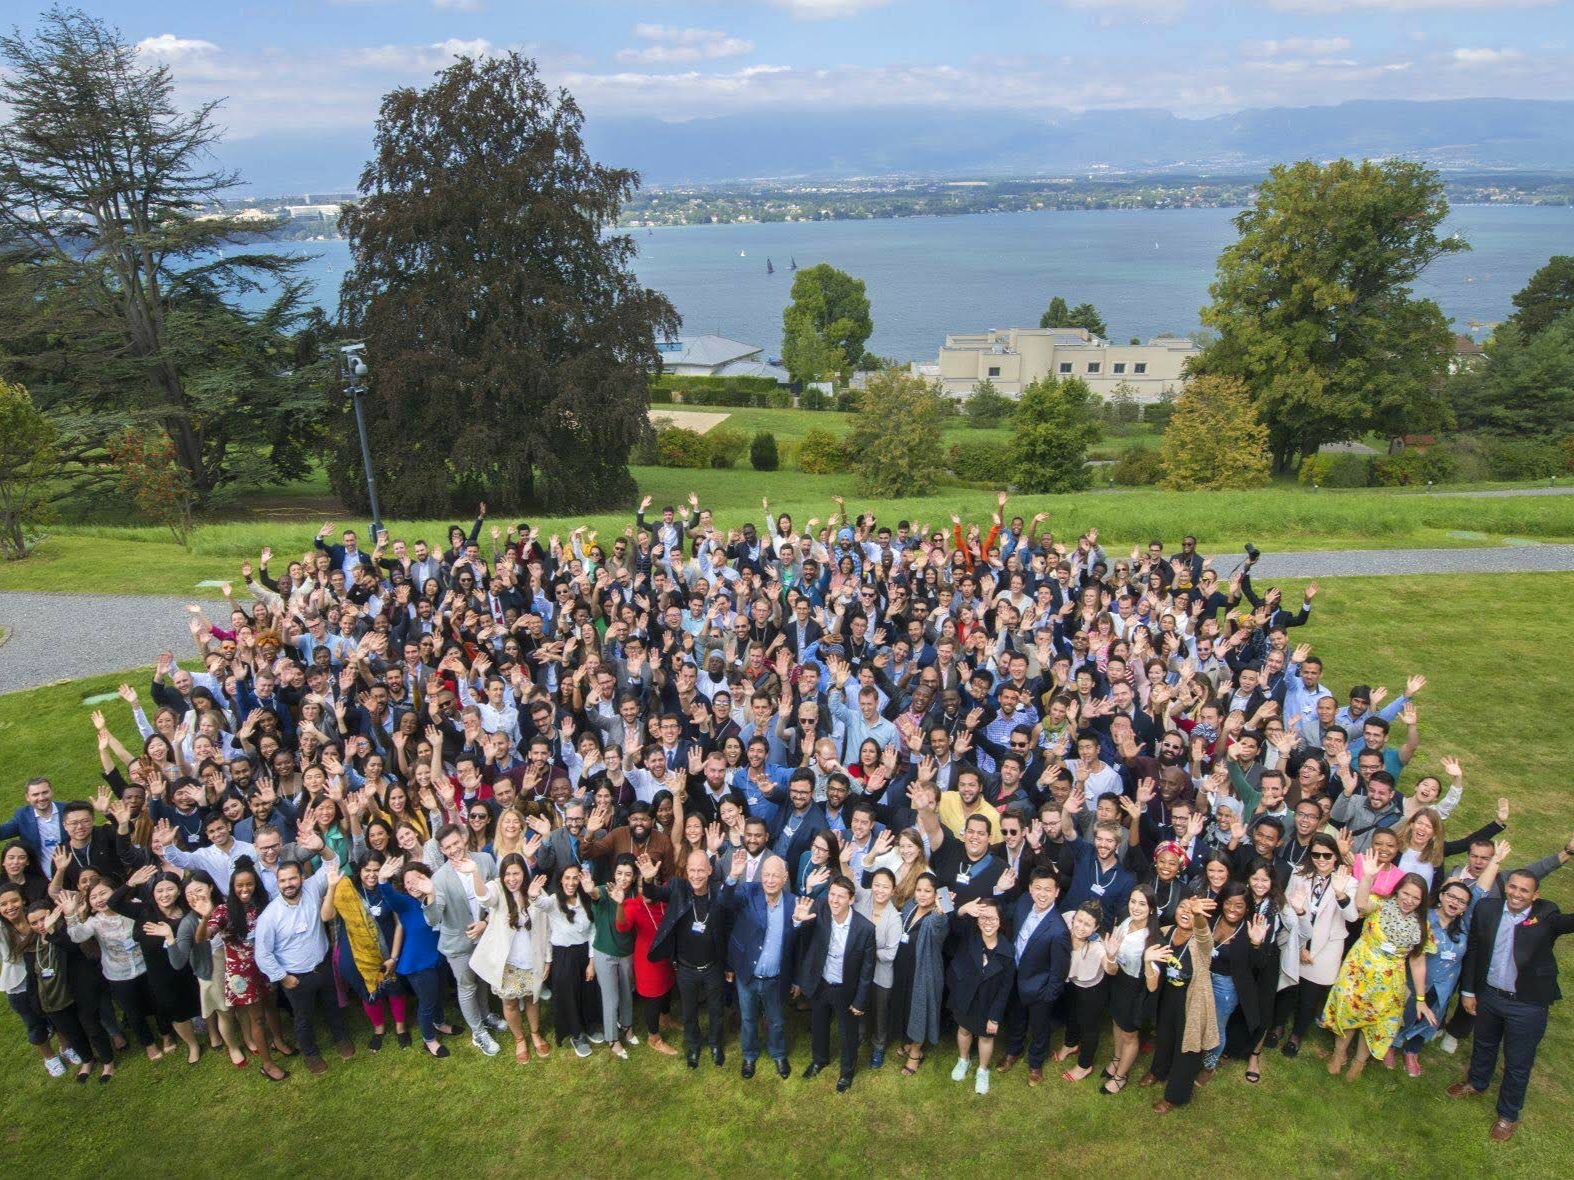 World Economic Forum Global Shapers Summit in Geneva, Switzerland